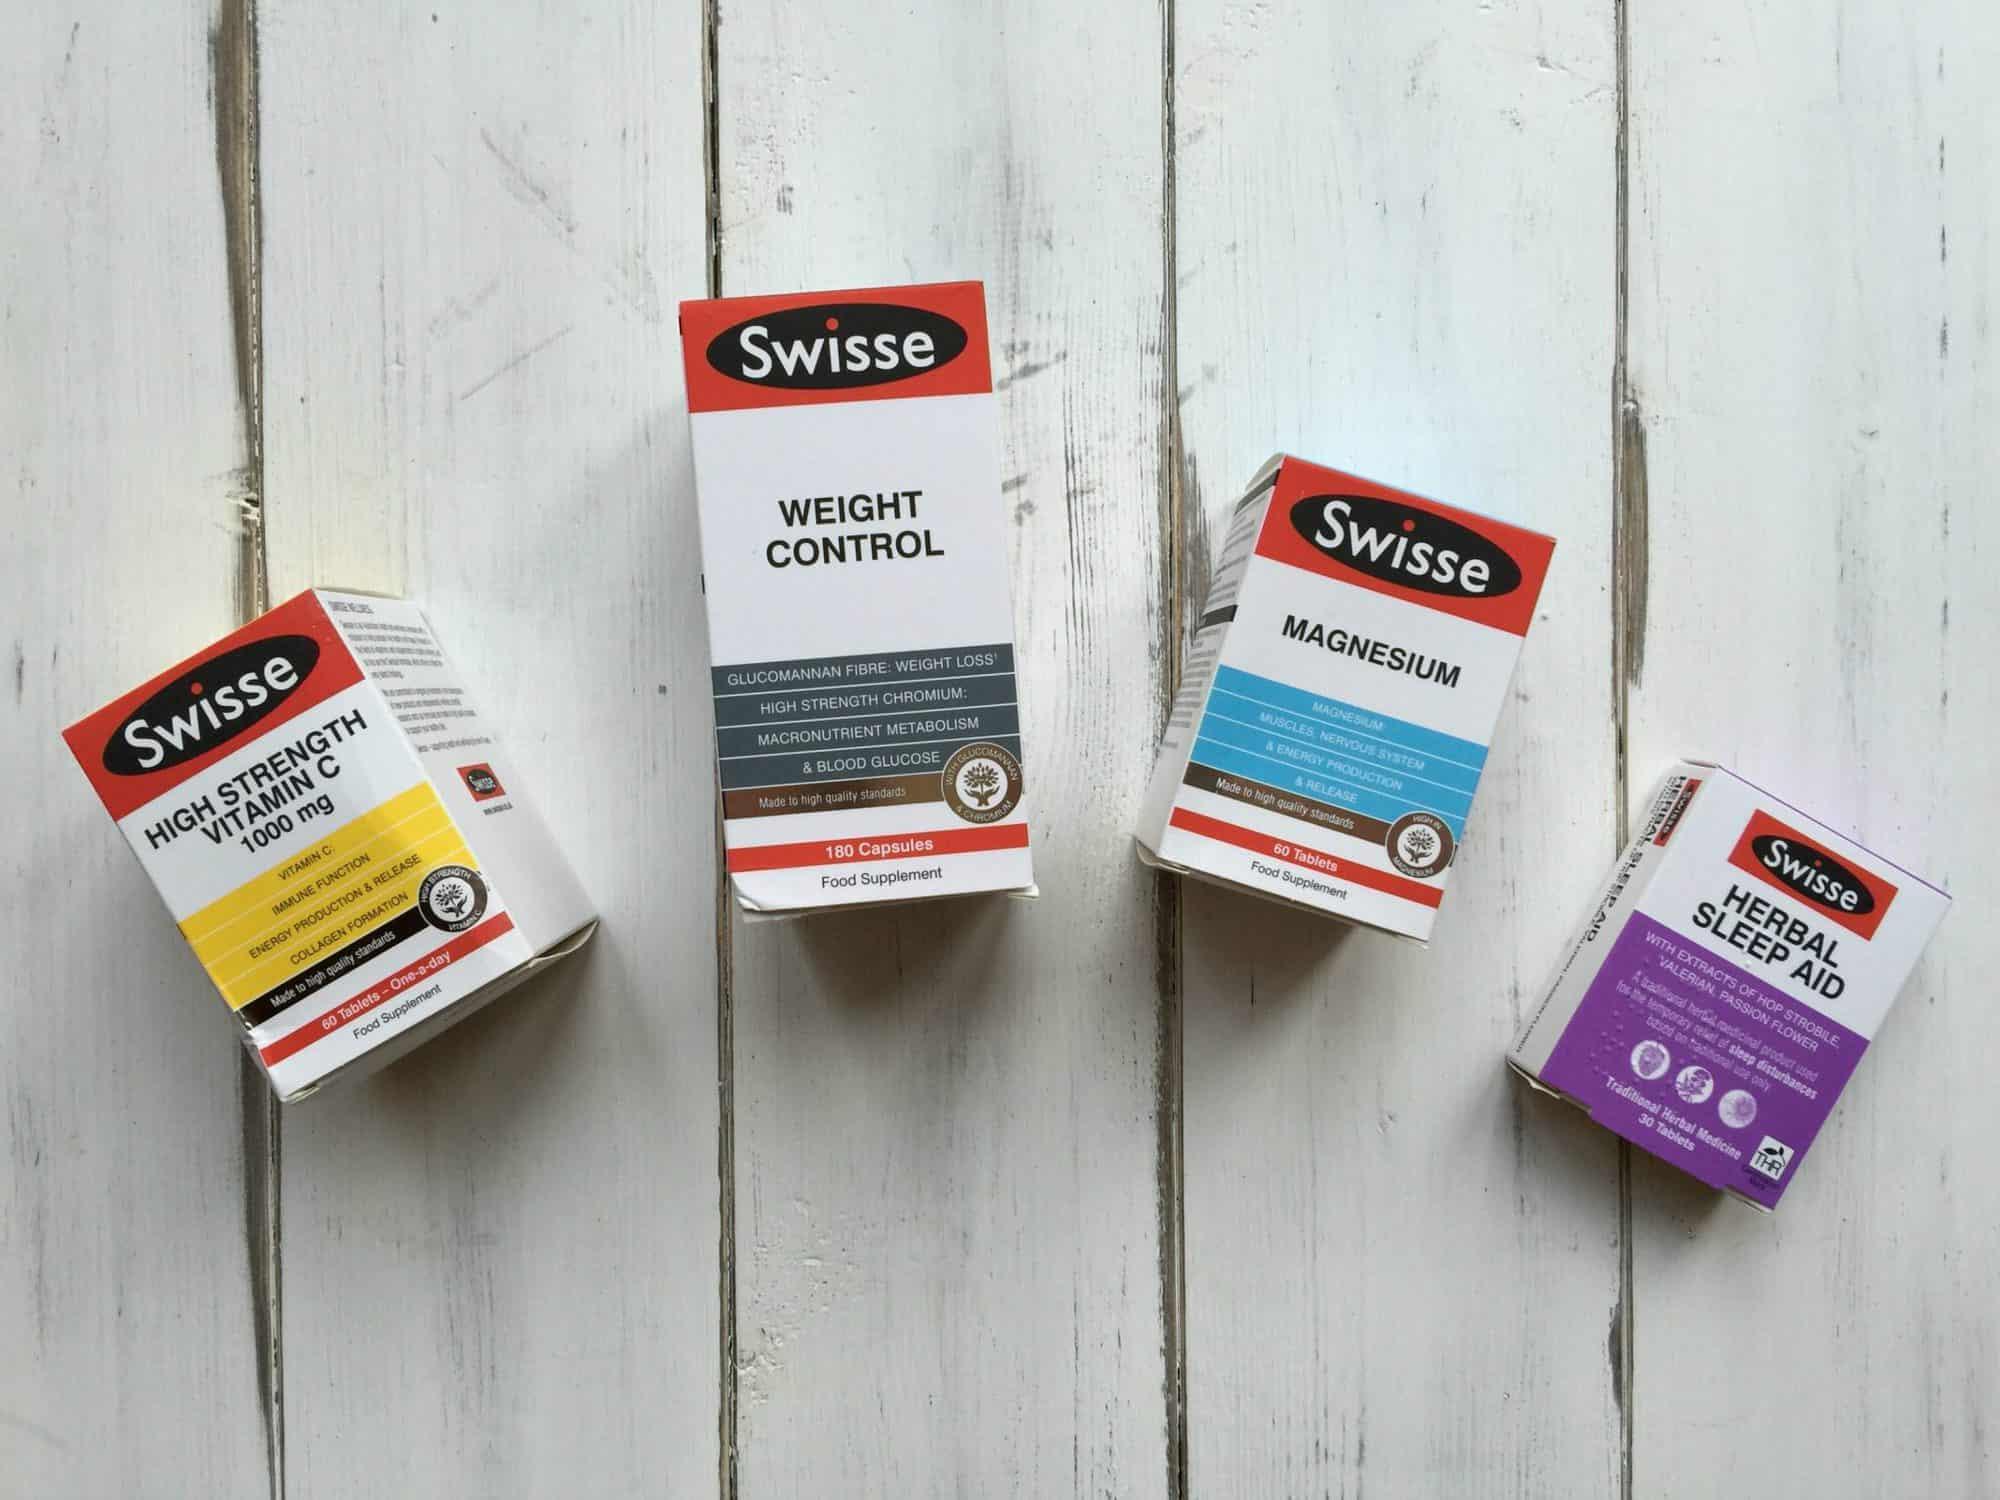 Swisse vitamins range